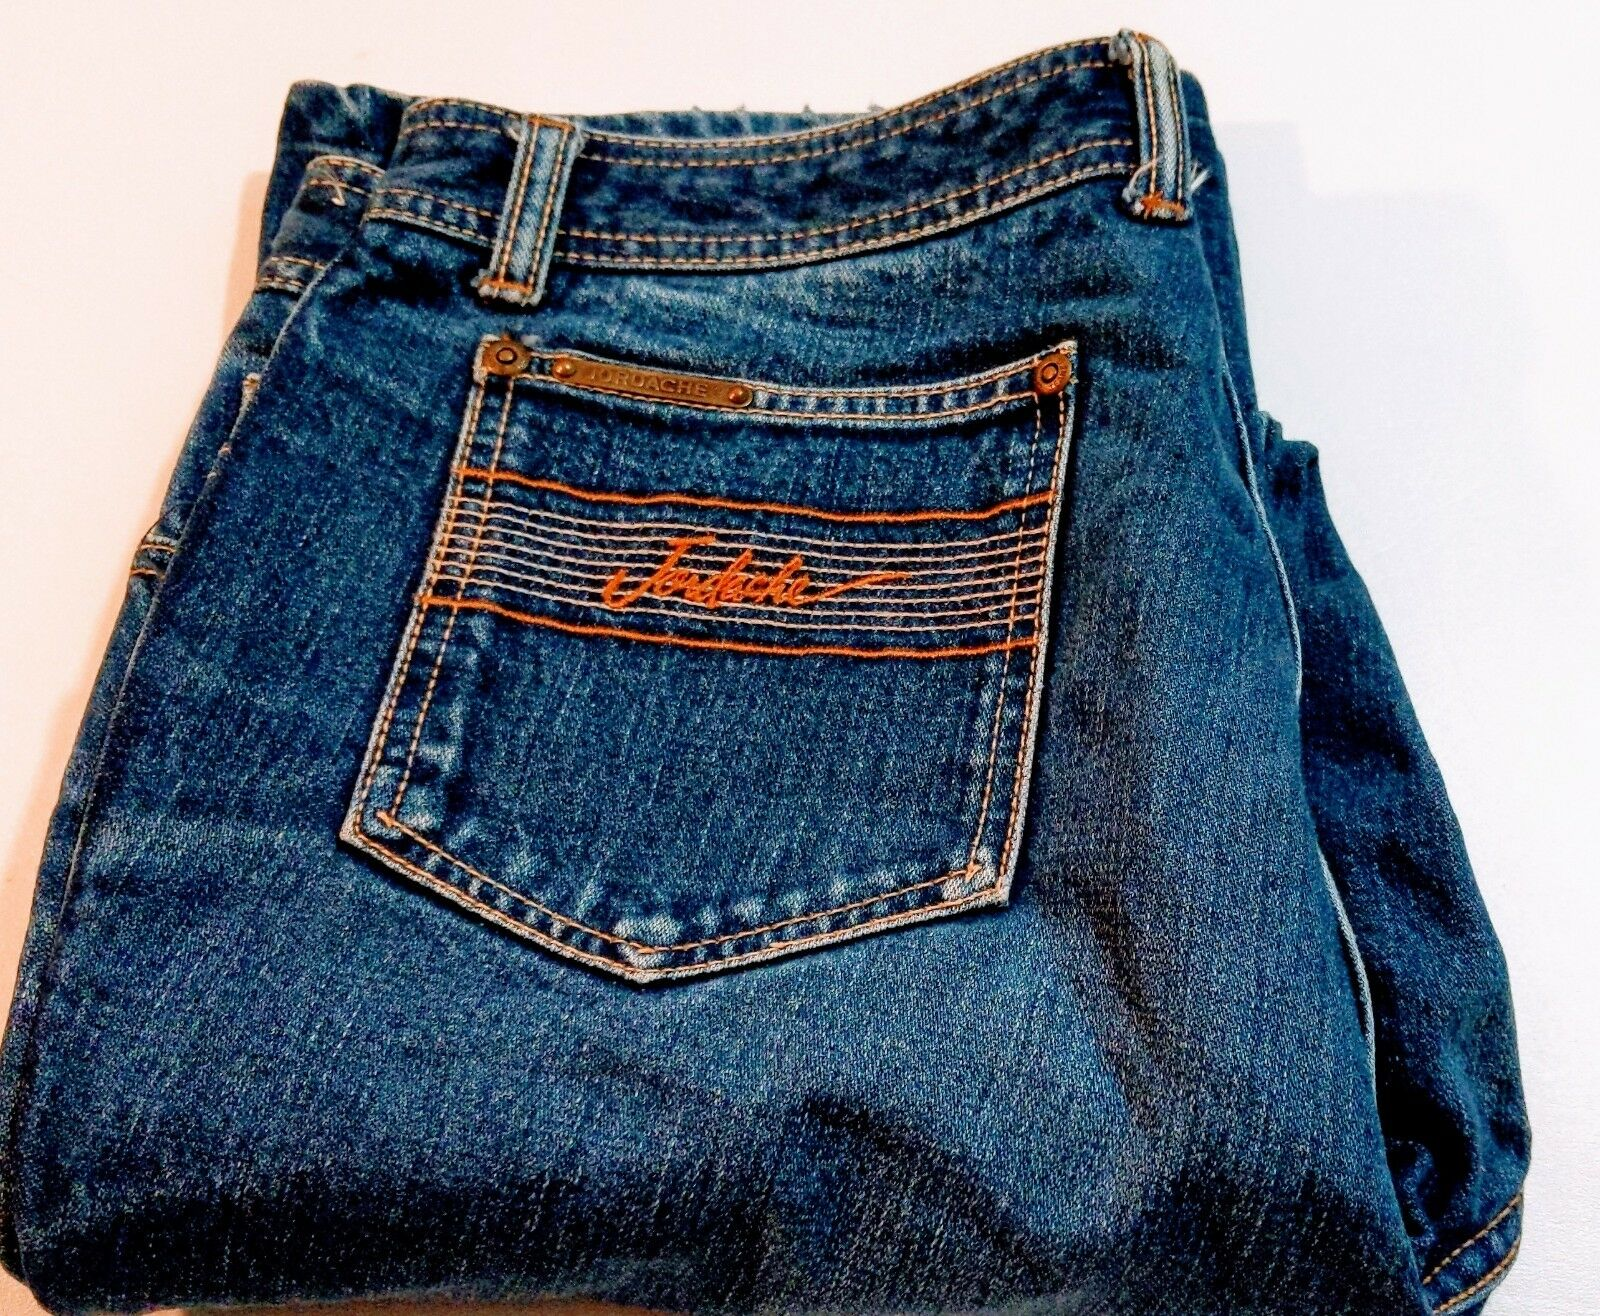 Jordache bluee Jeans Vintage Size 34L Straight Cut Medium Wash